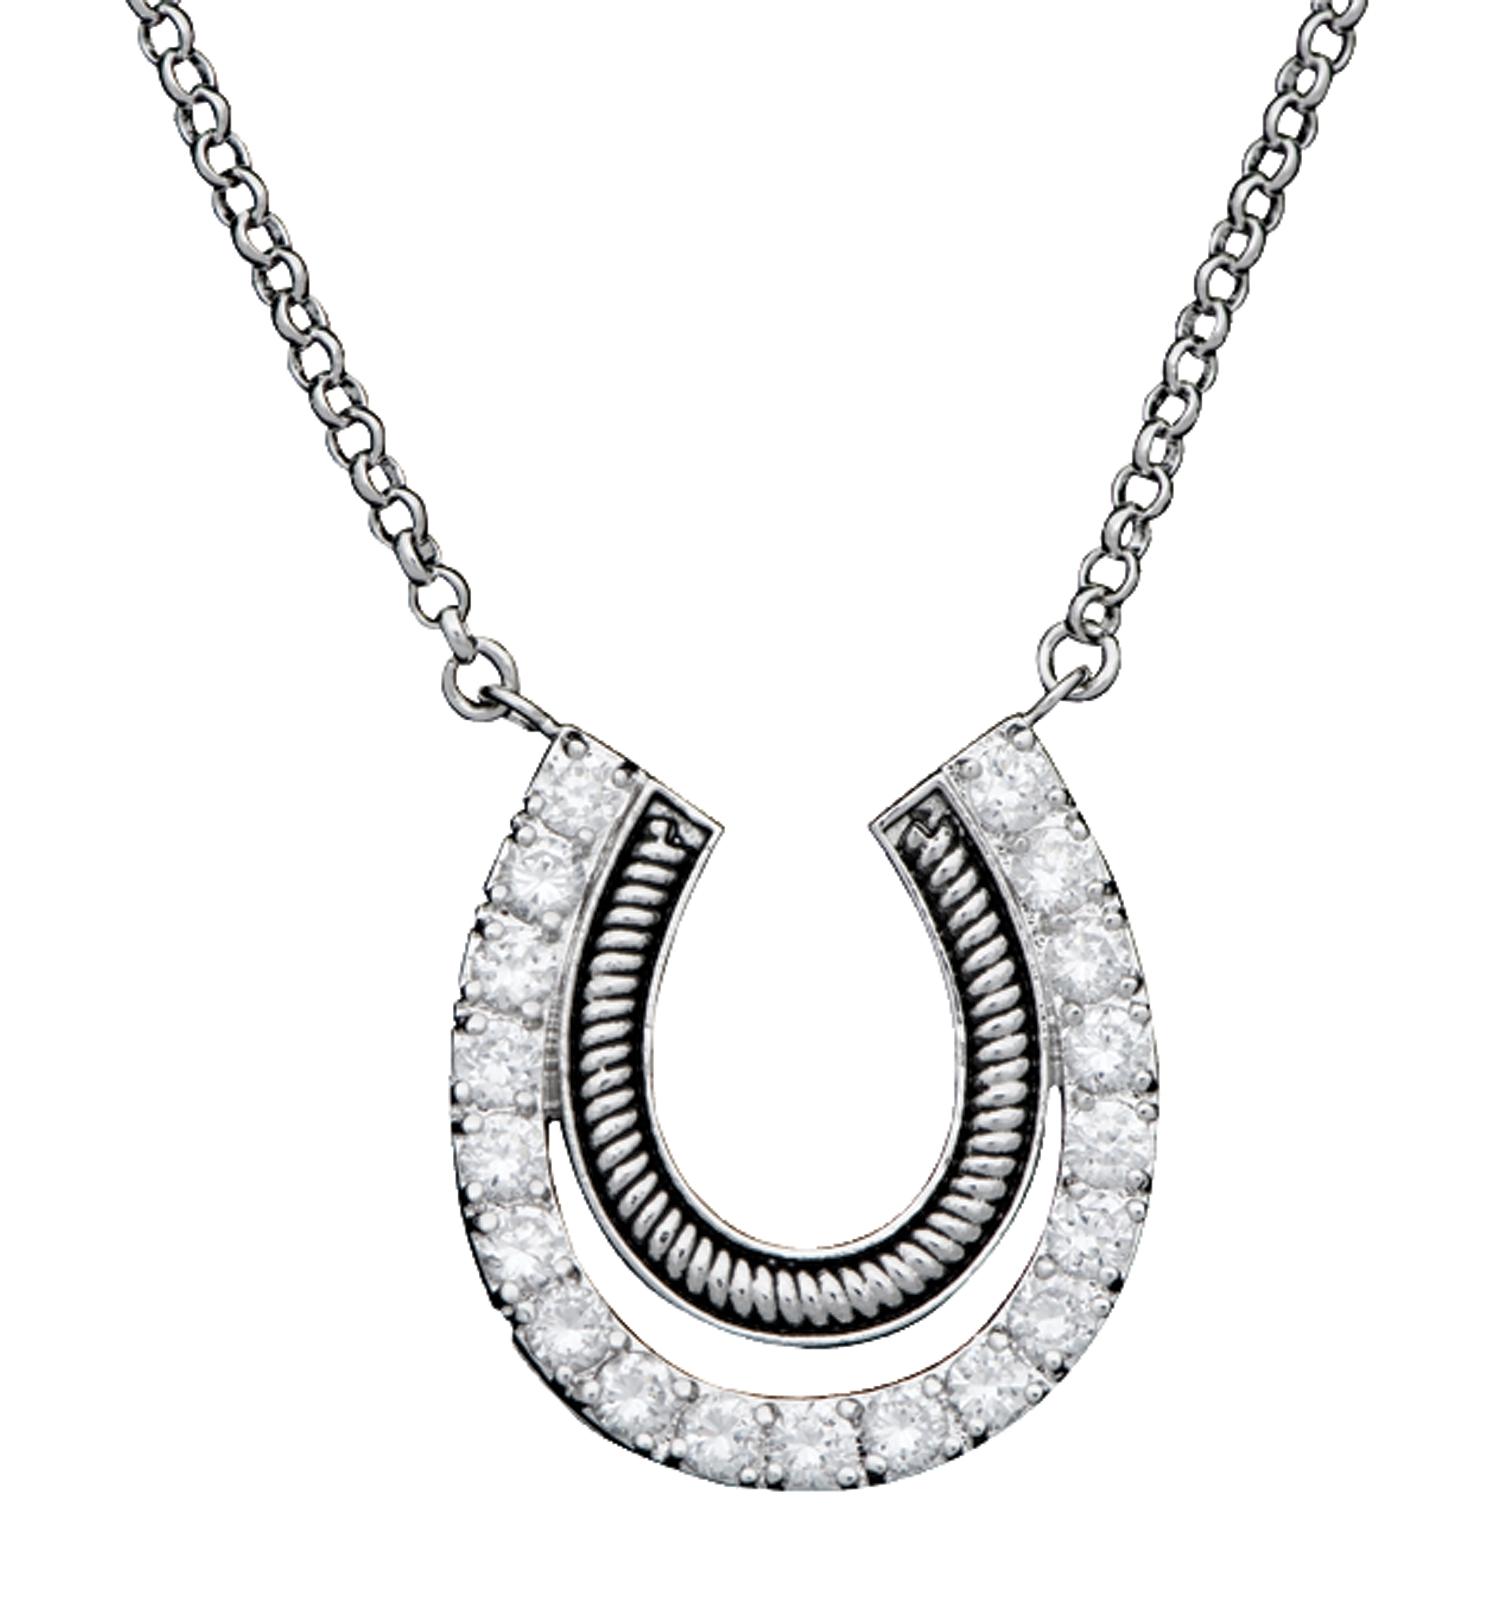 Montana Silversmiths Vintage Charm Pony Trekker Necklace